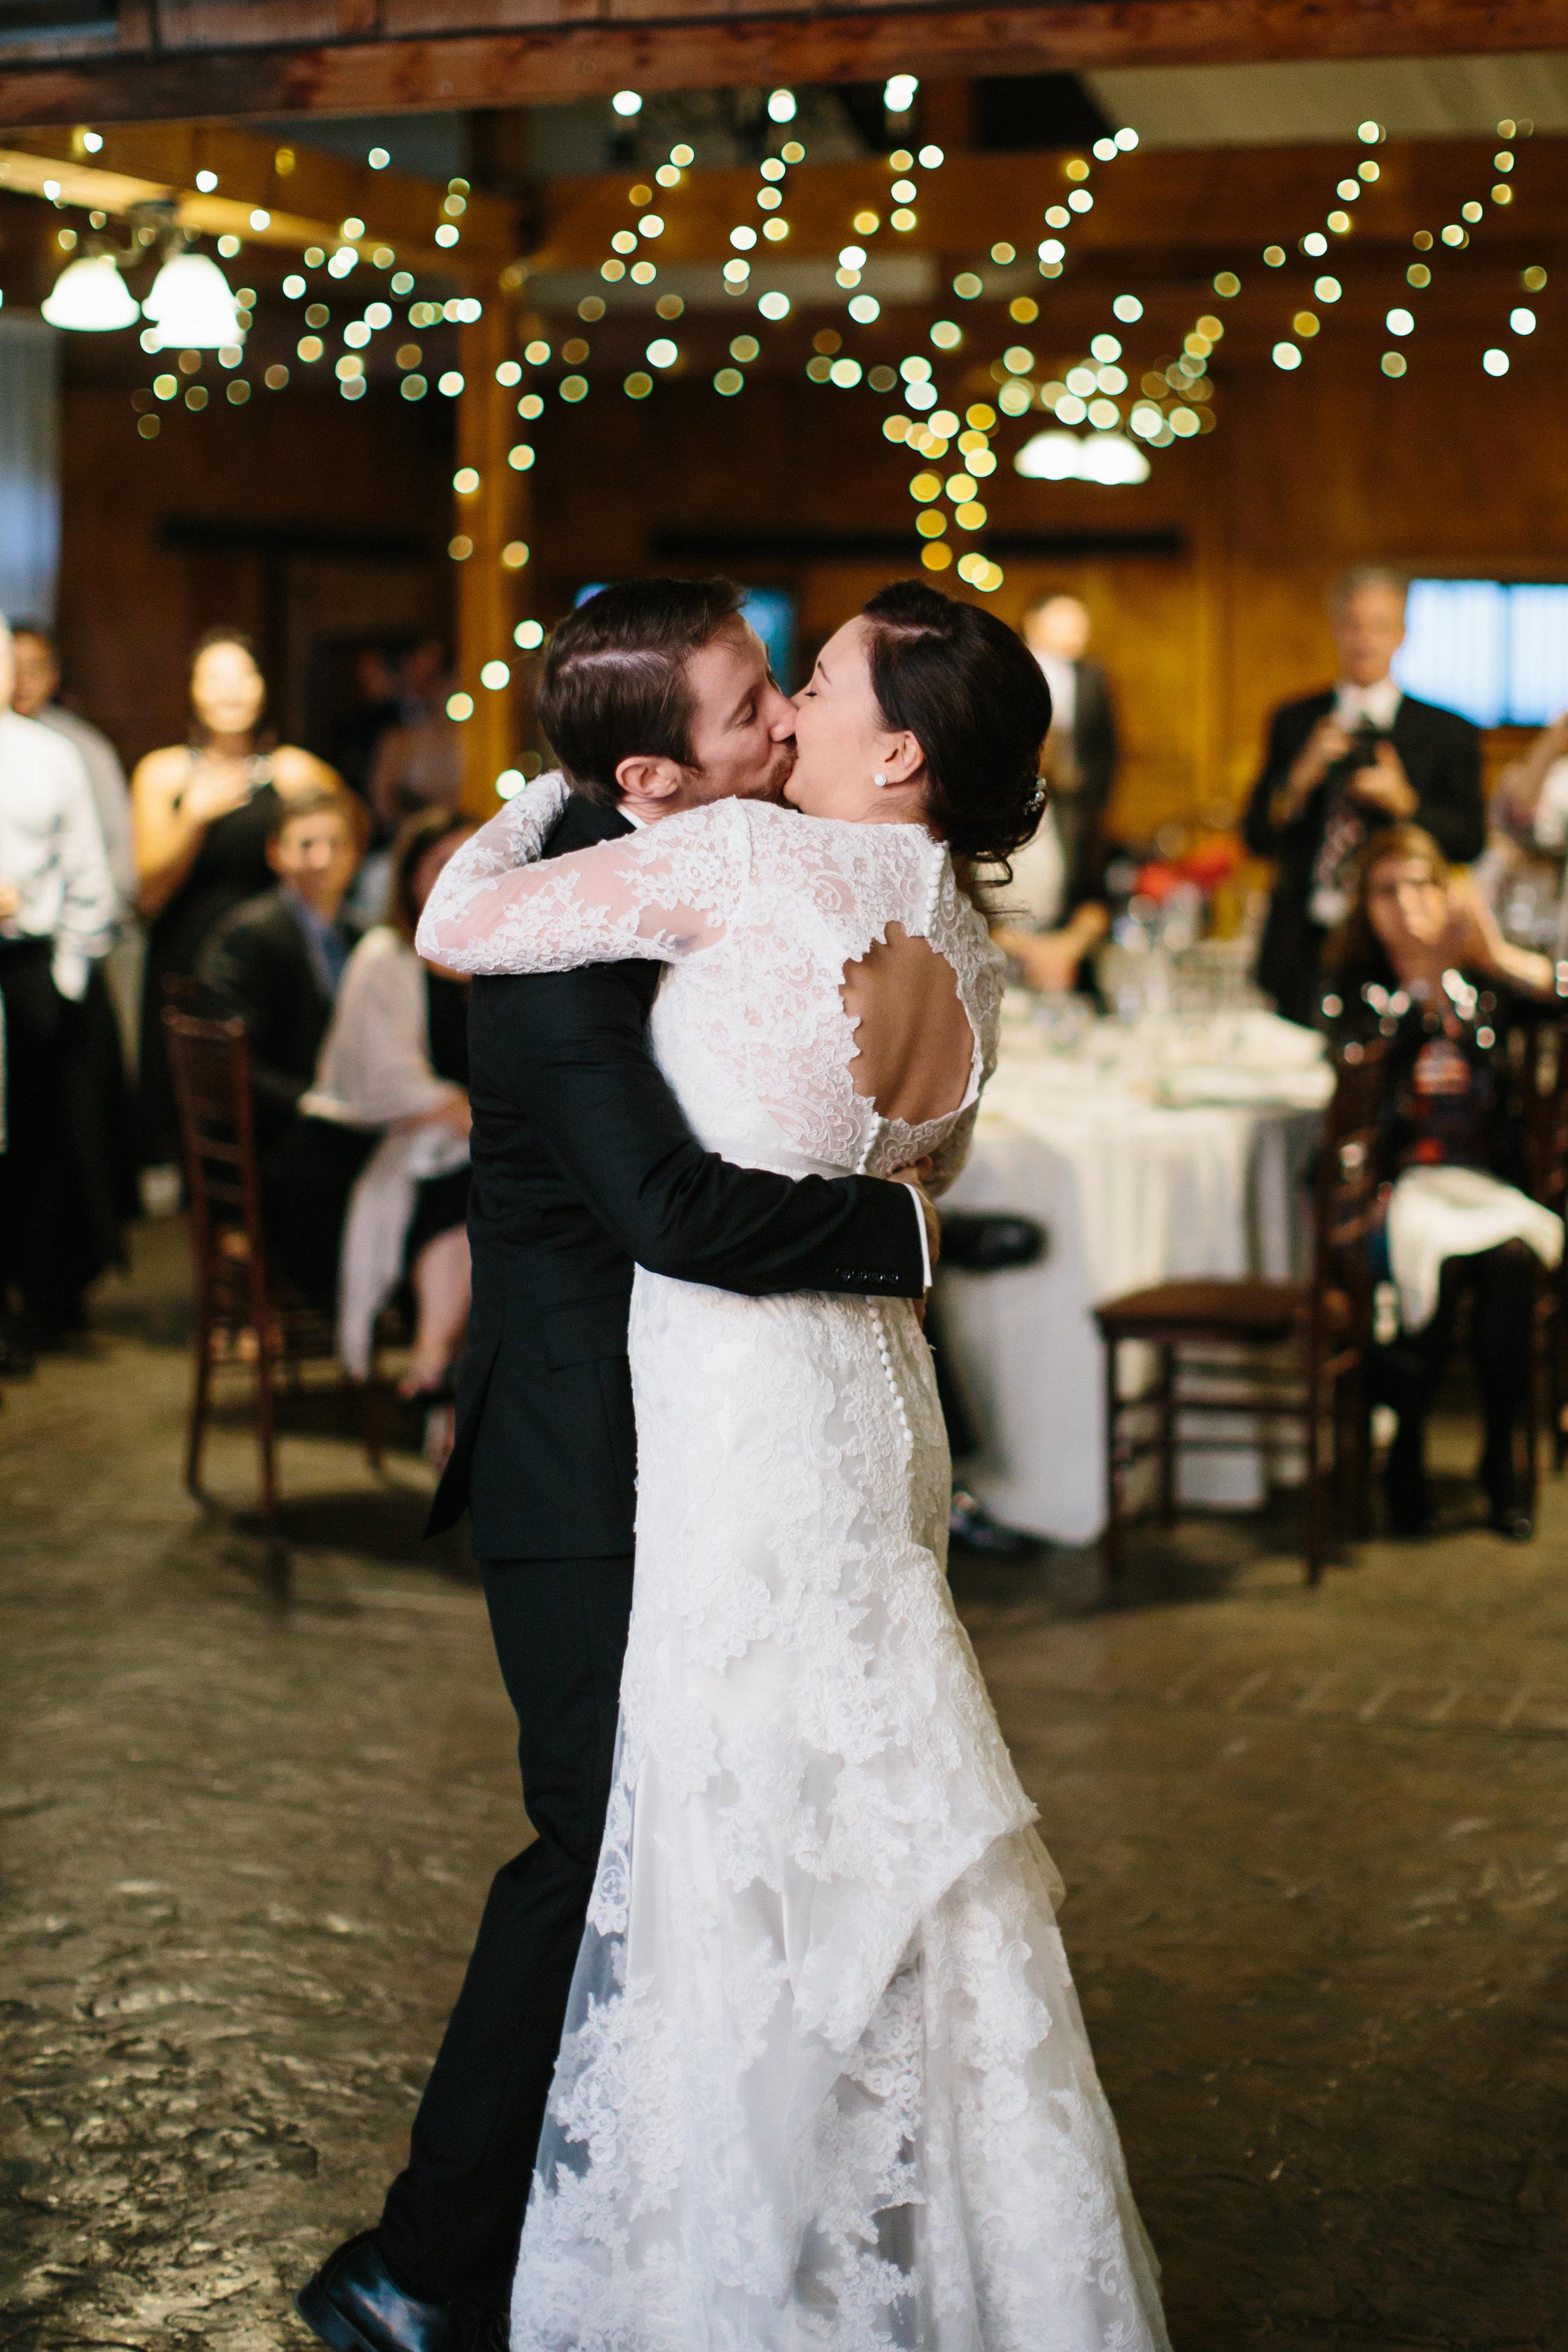 Korena + Andrew on October 12, 2015  ♥ Sarah Bradshaw Photography at The Stable at Bluemont Vineyard (Bluemont, VA)